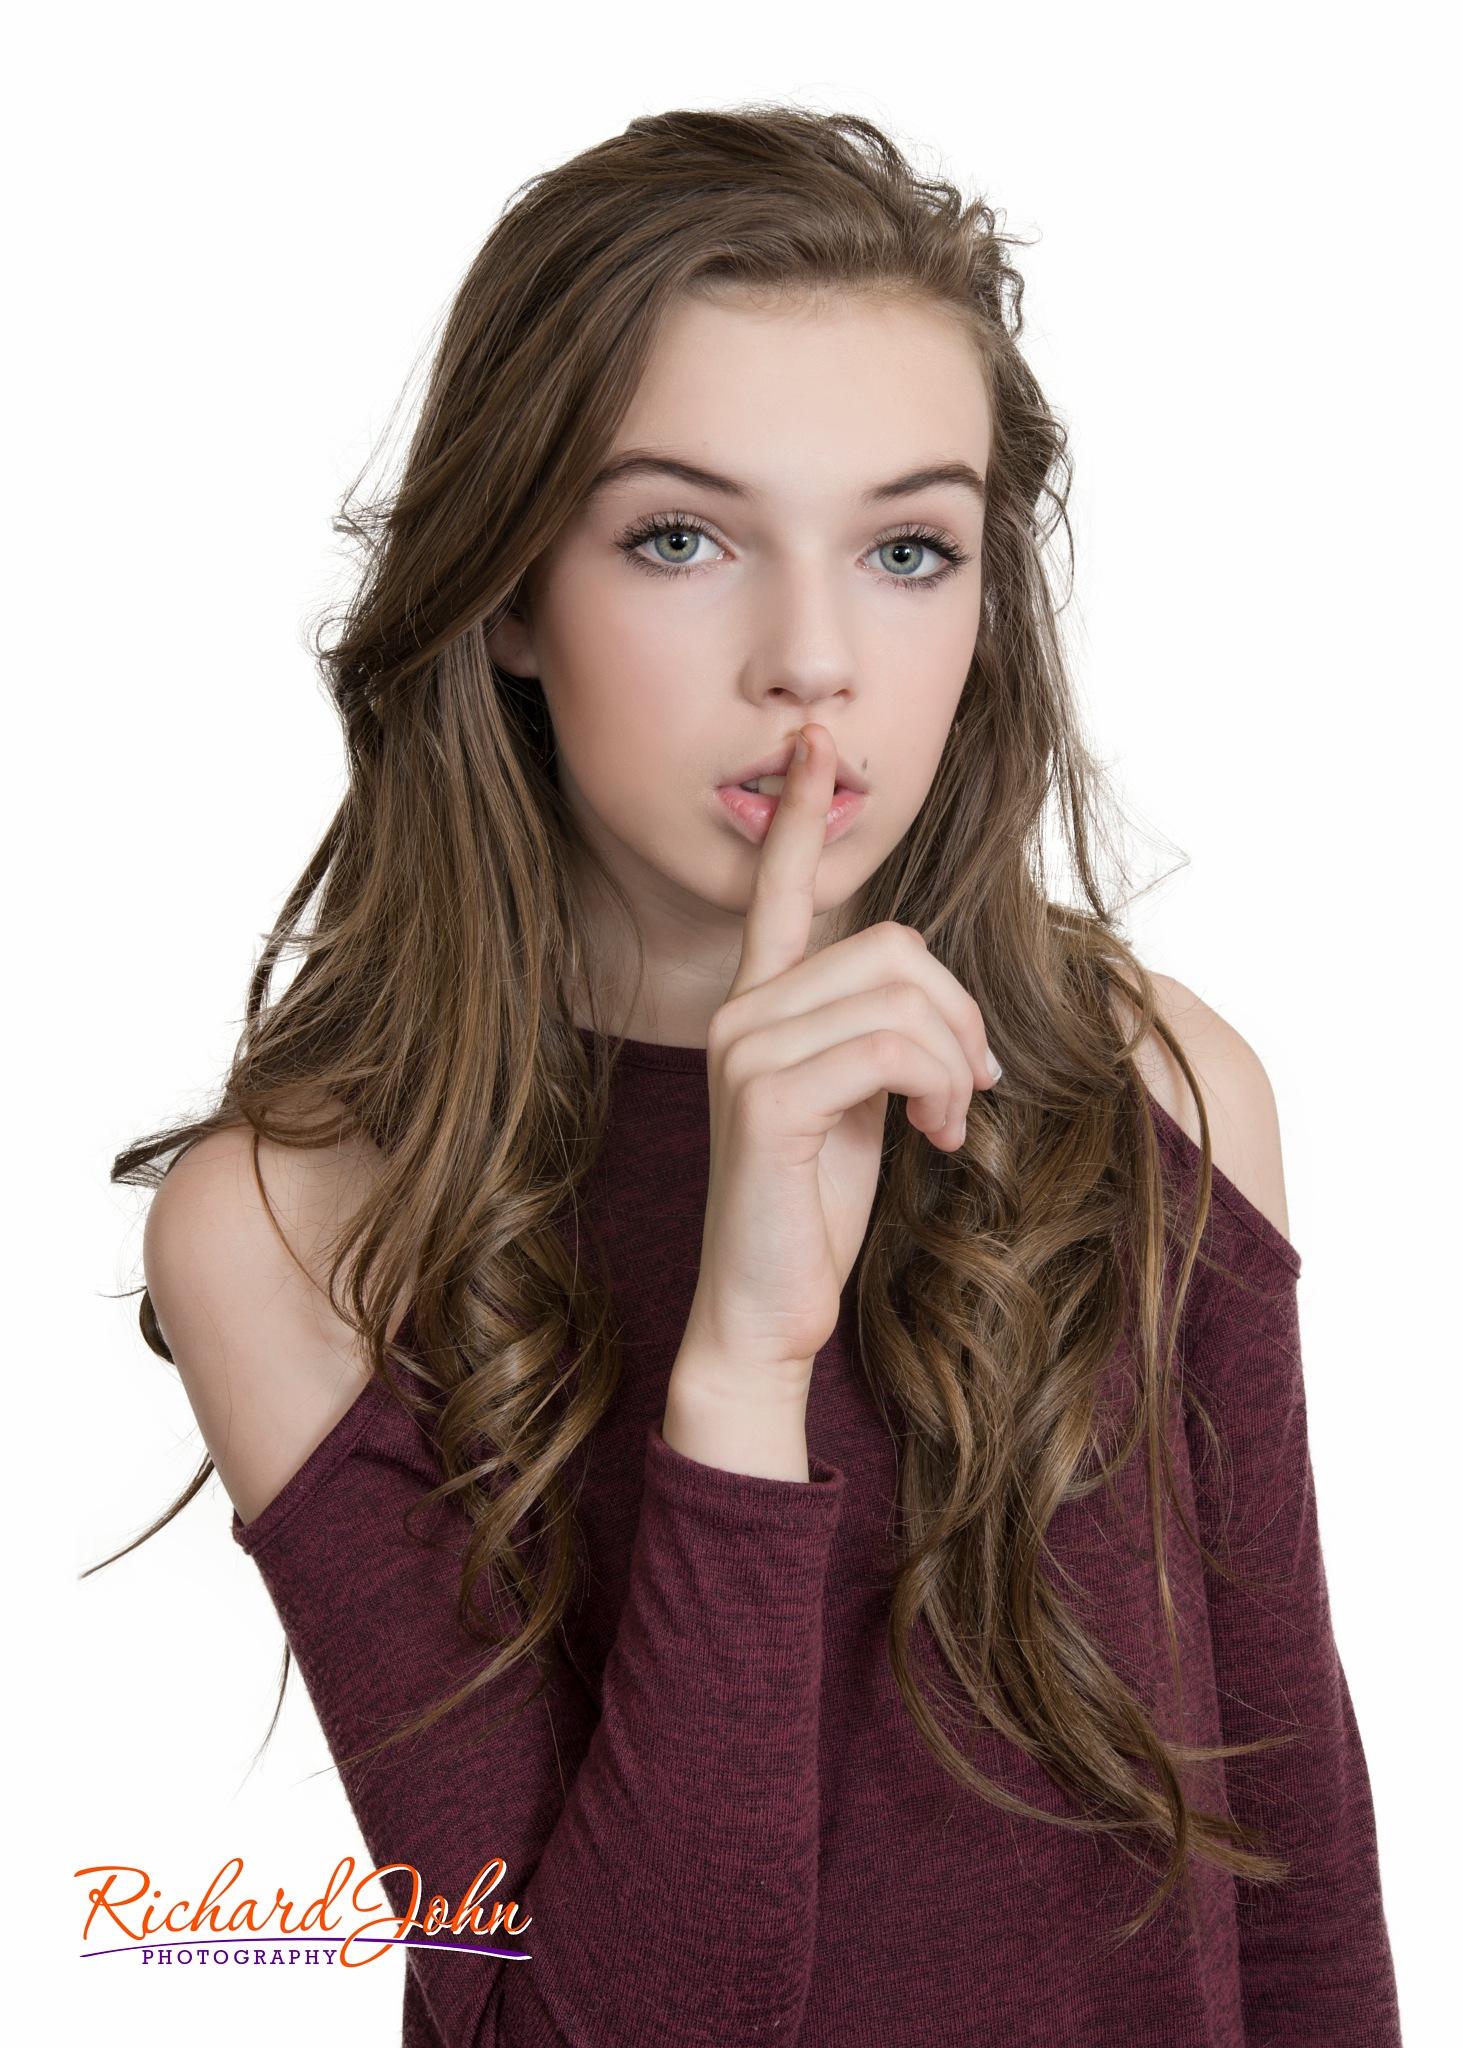 Shhhhhh please by RichardJohnPhotography